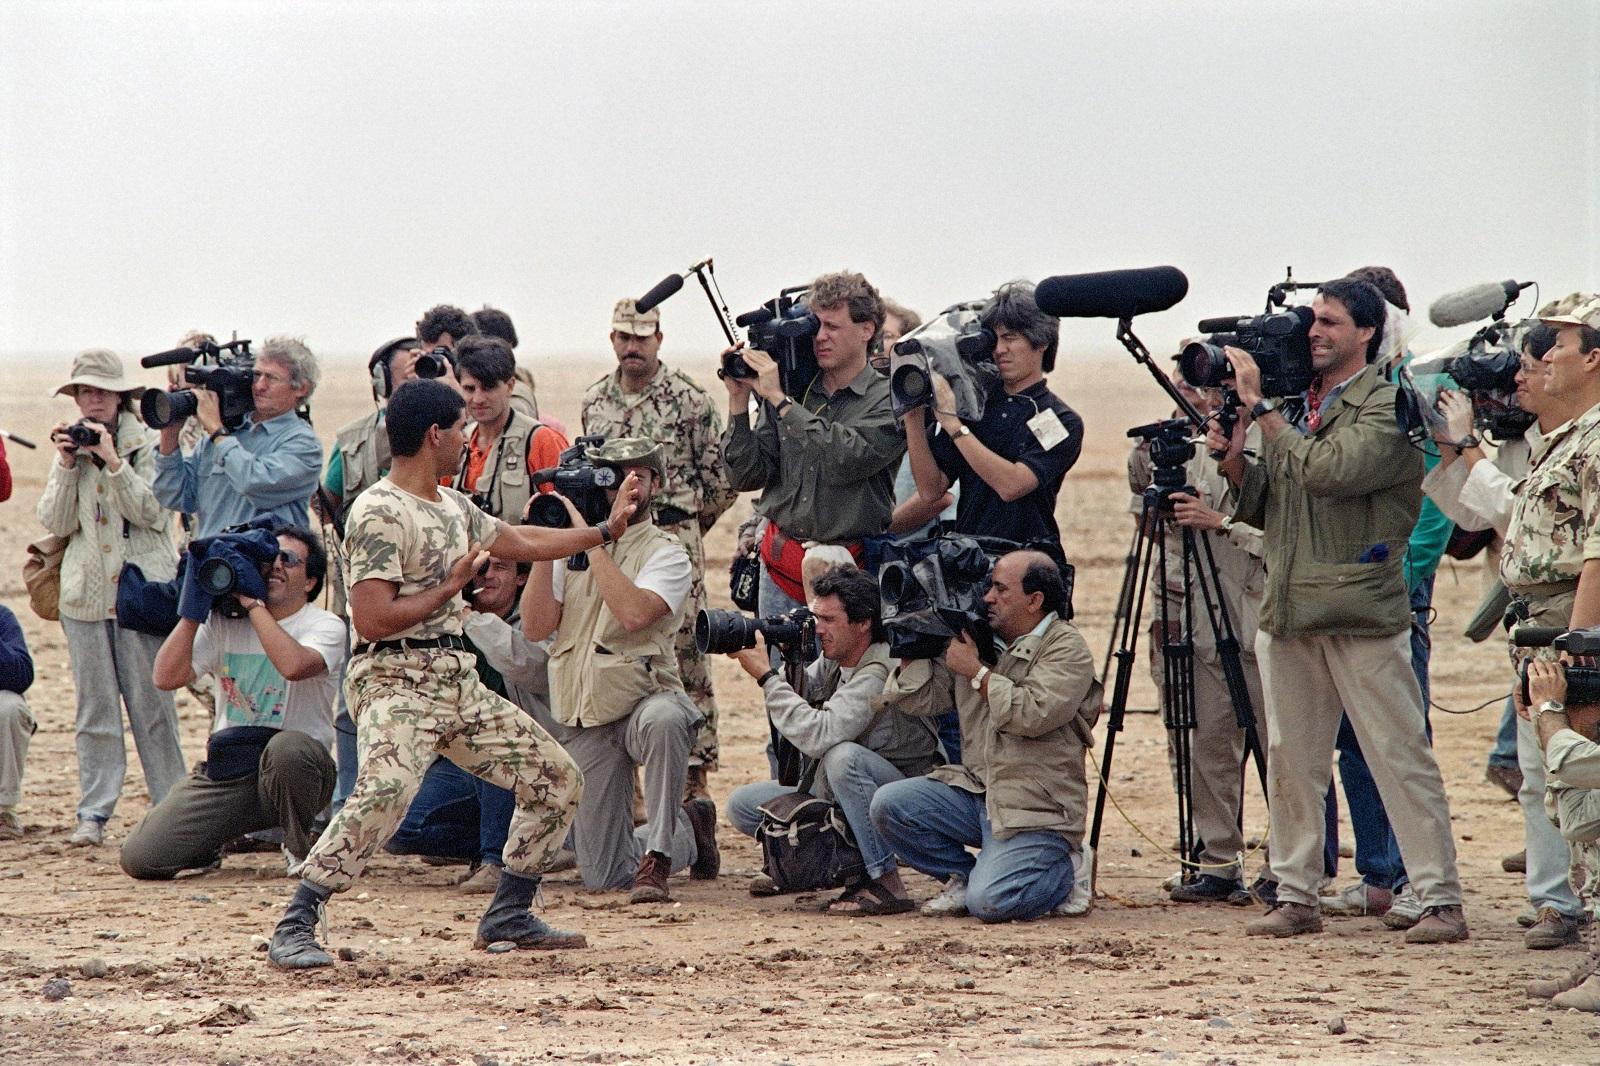 The U.S. Has Wasted Billions of Dollars on Failed Arab.